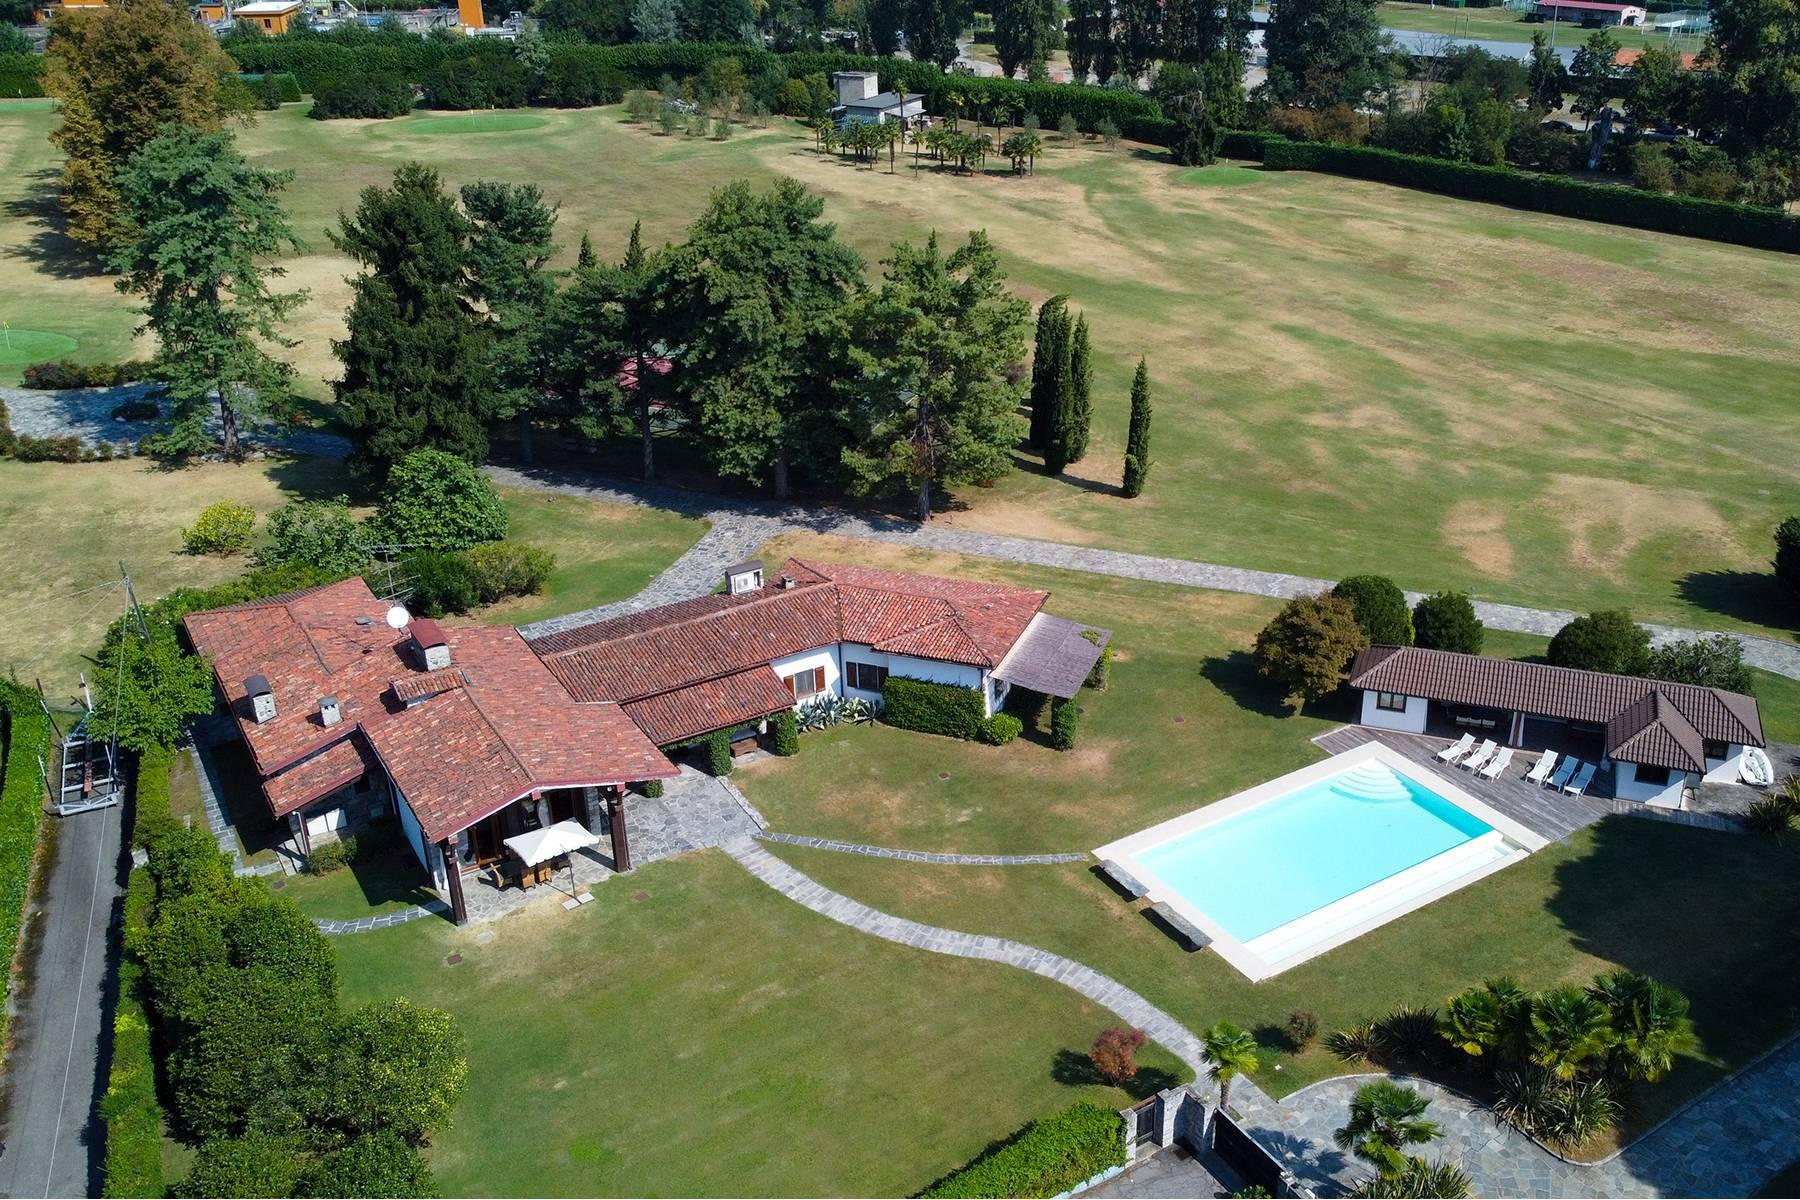 Charmante Villa in Lesa, mitten in der Natur - 34